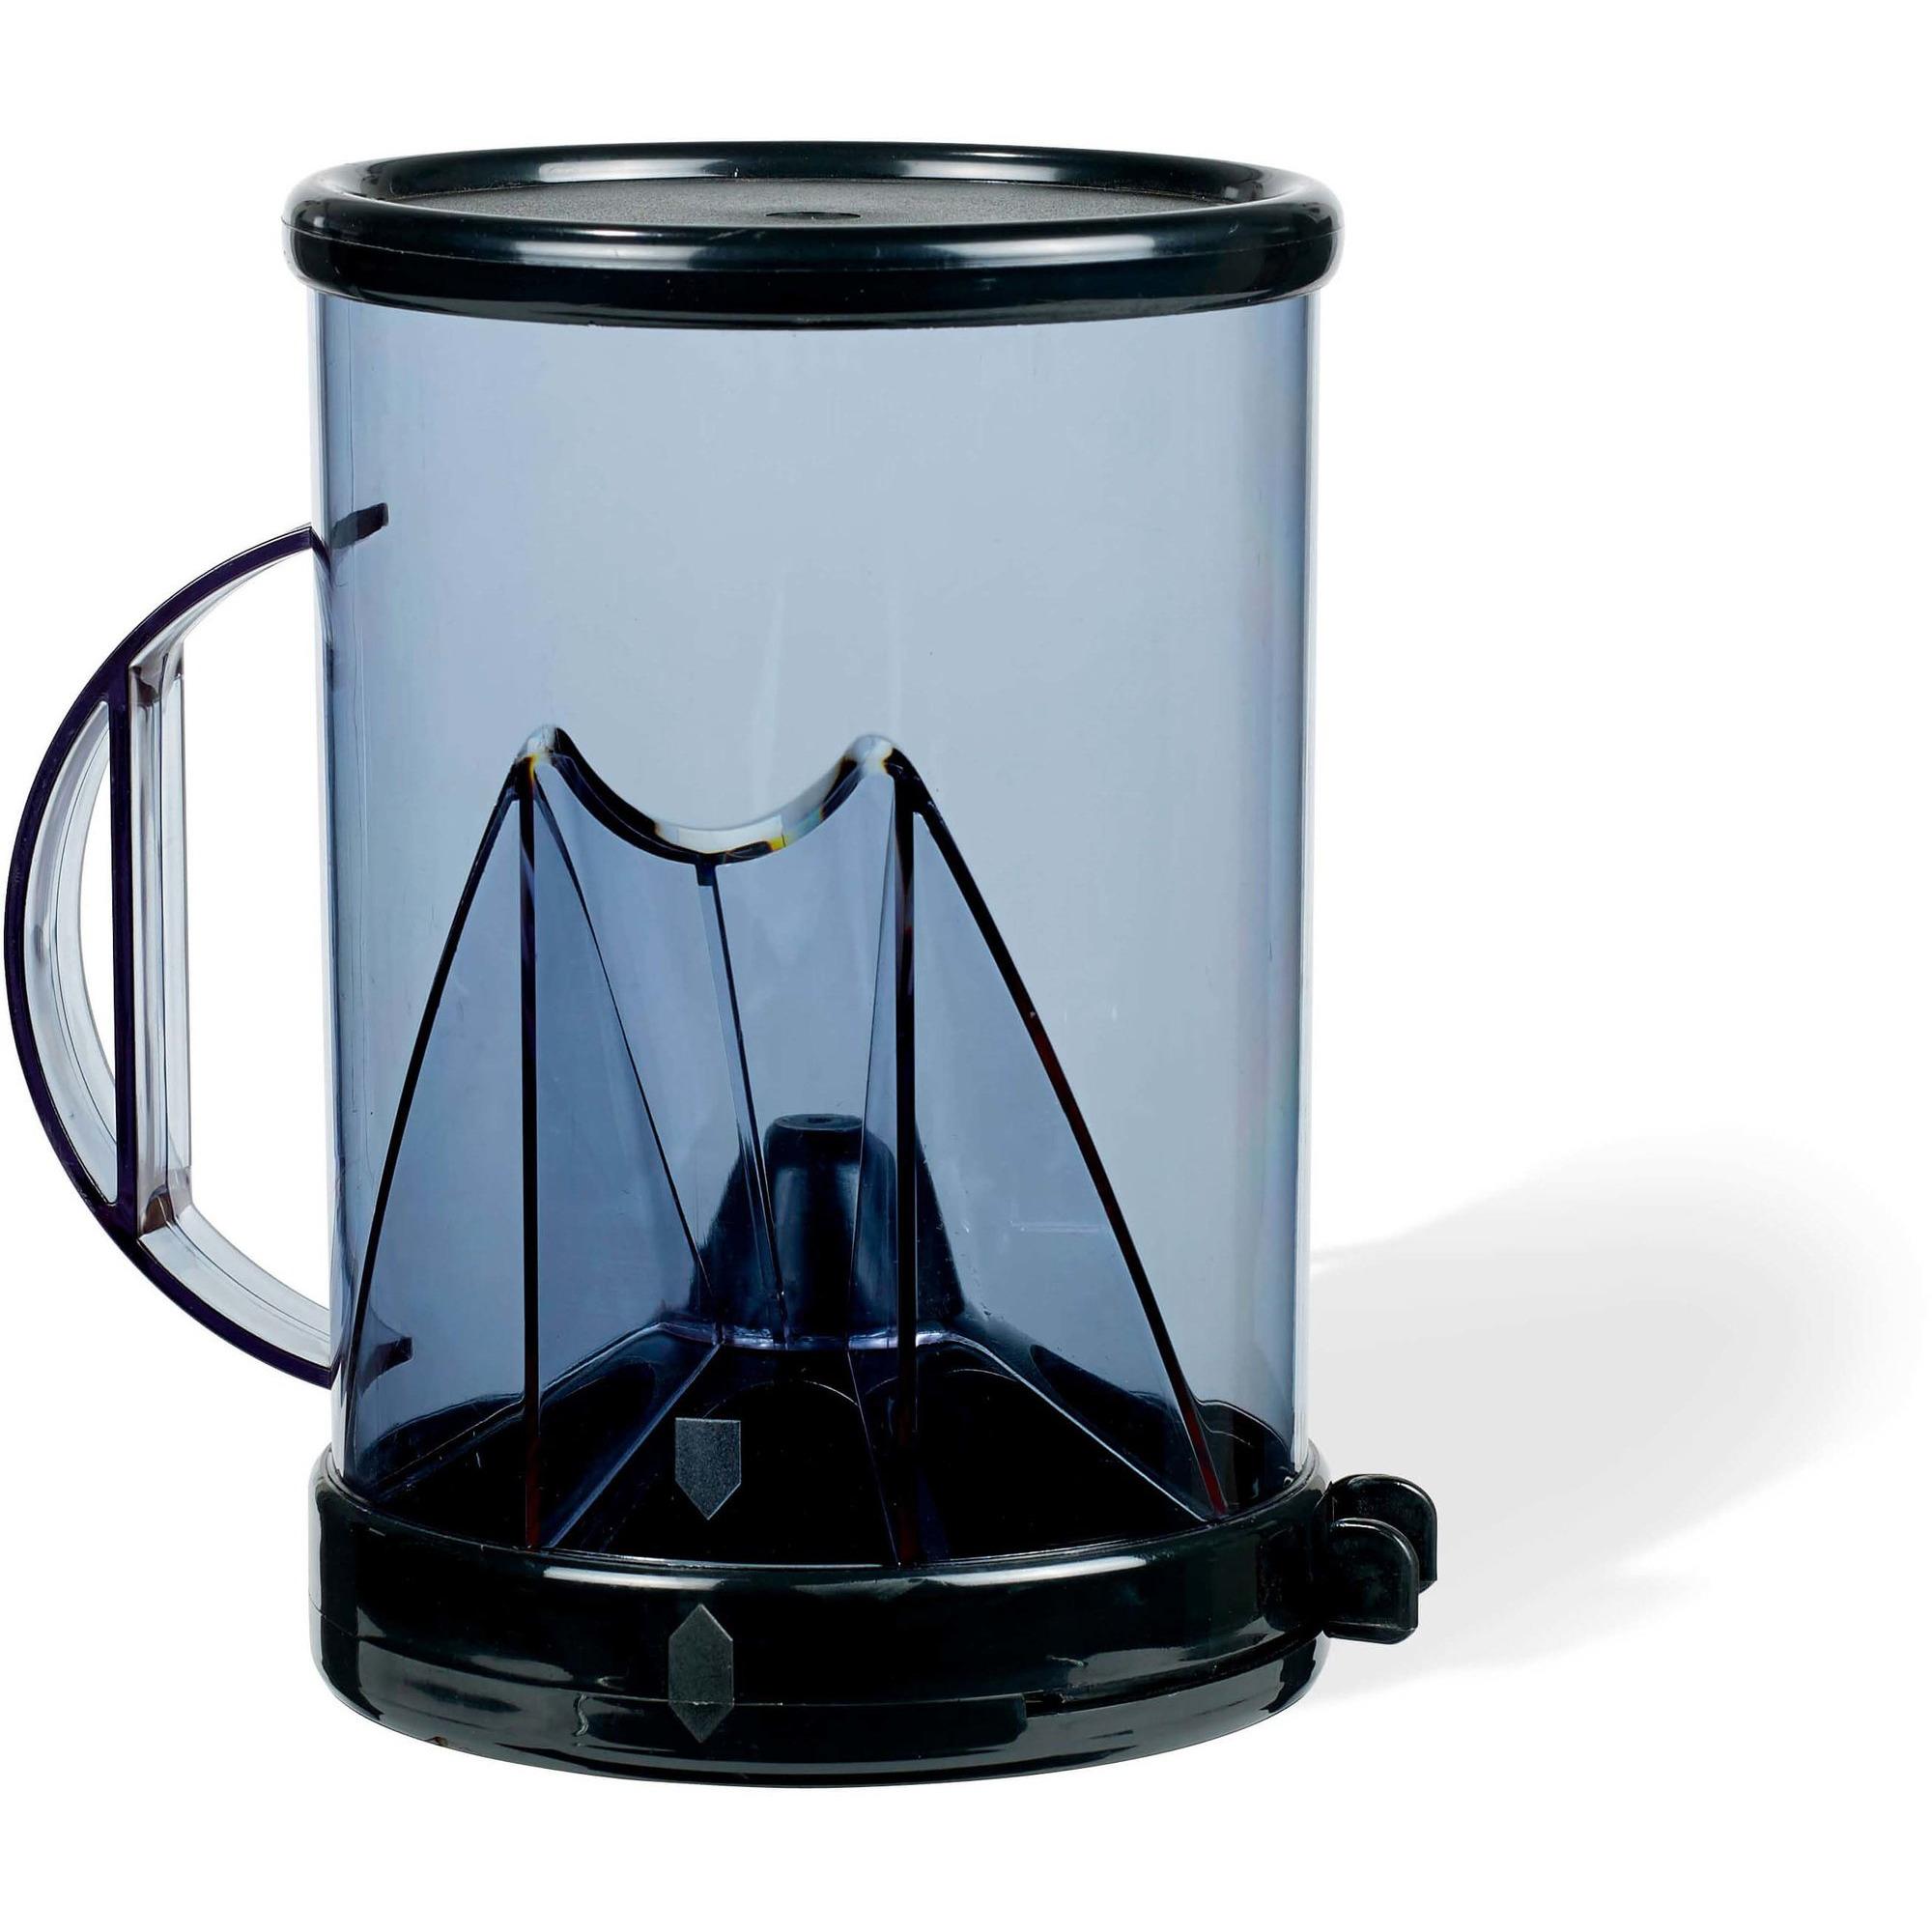 Kitchen Basic Nordiska Kaffedoserare med lock